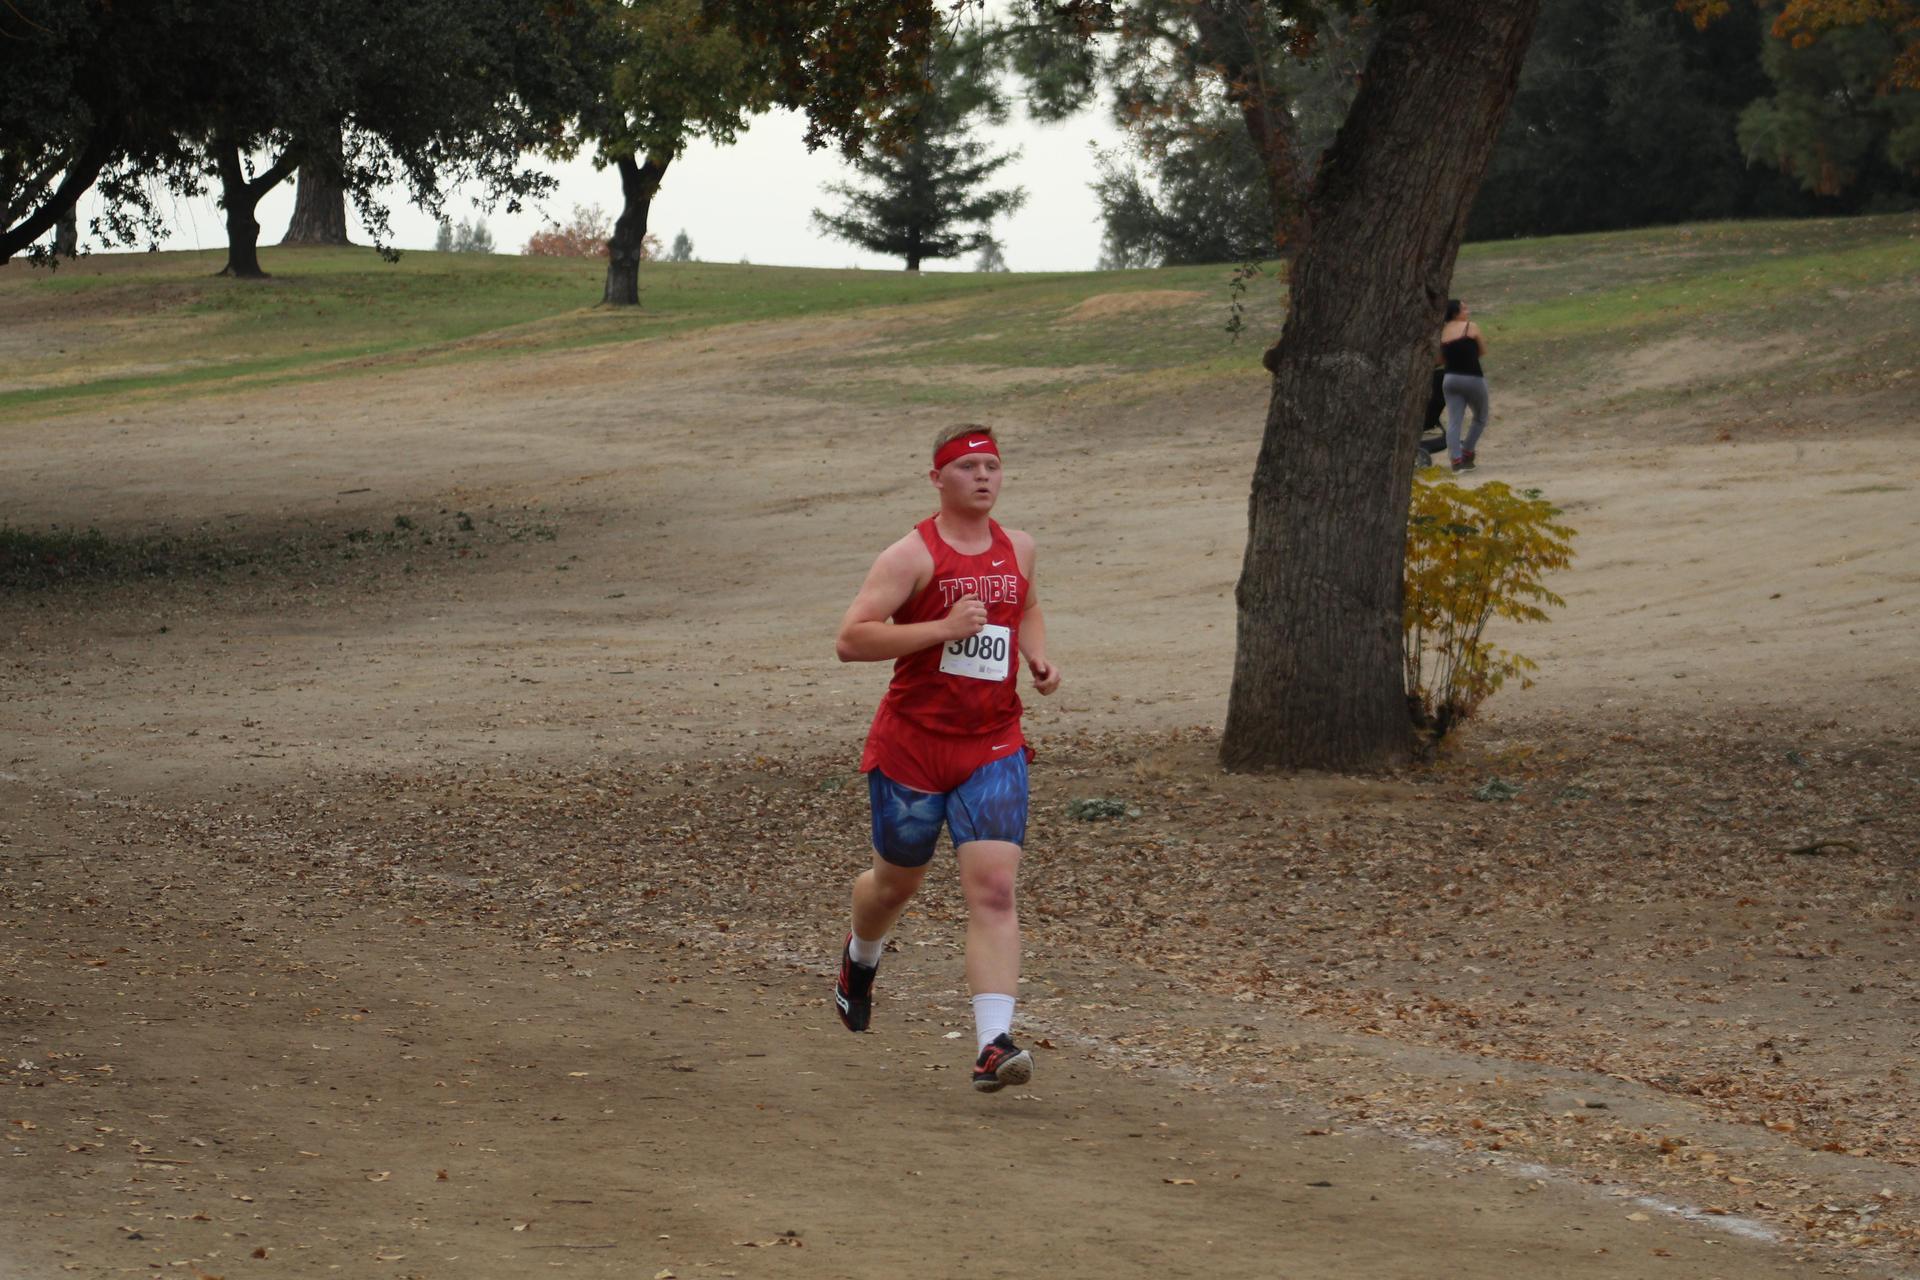 Zack Ellison racing at Woodward park